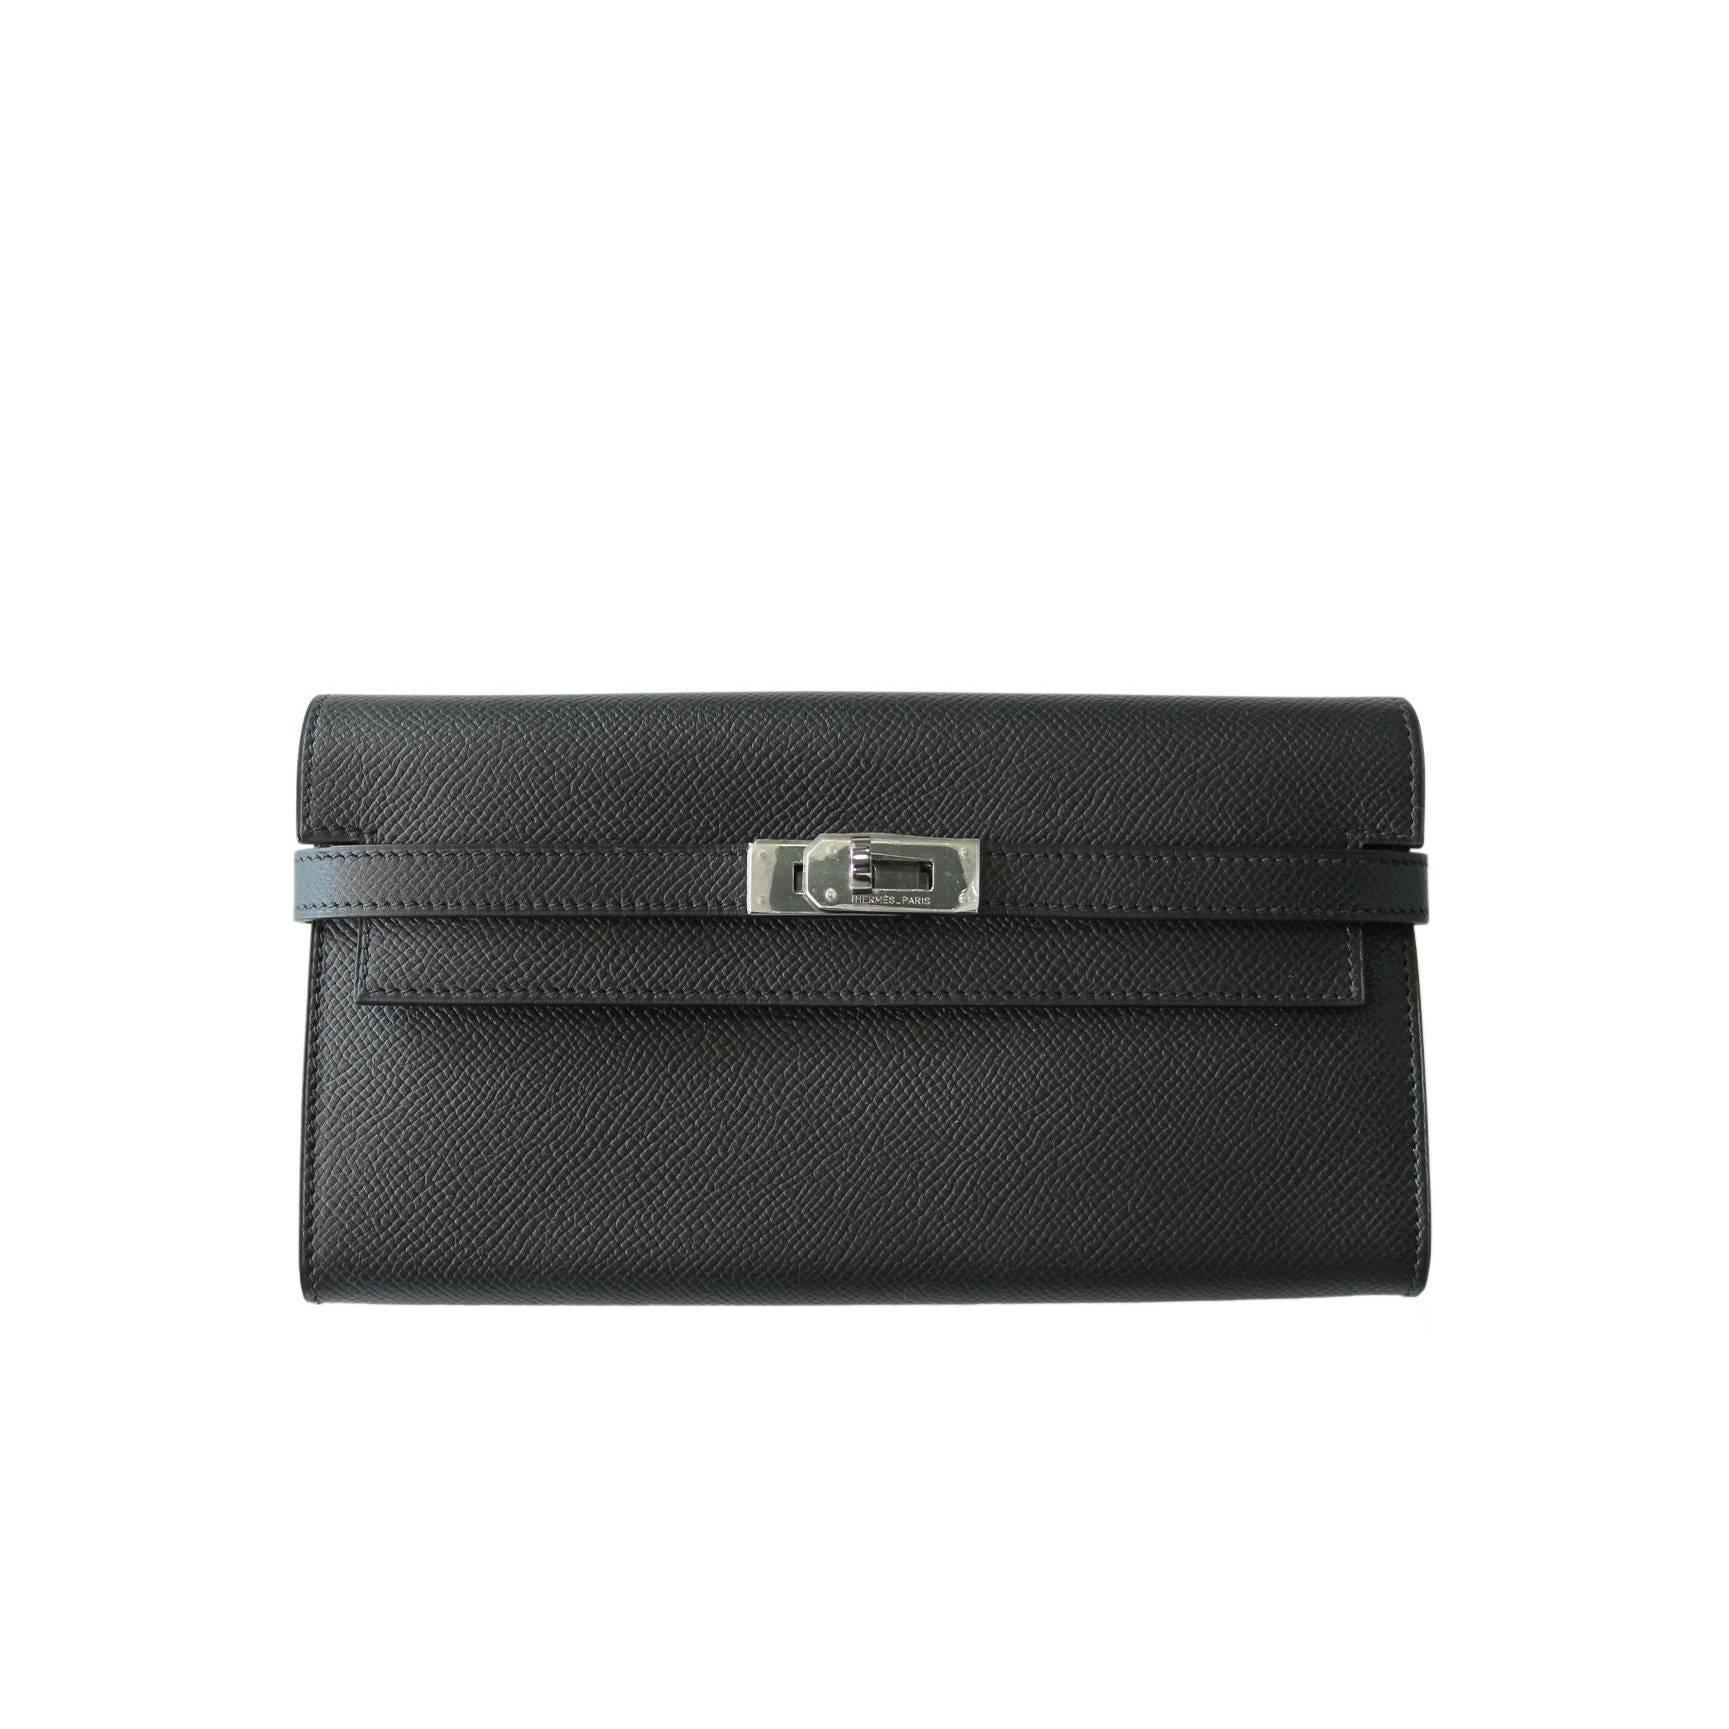 5c400dc22a4c Hermes Black Epsom Kelly Long Wallet SHW